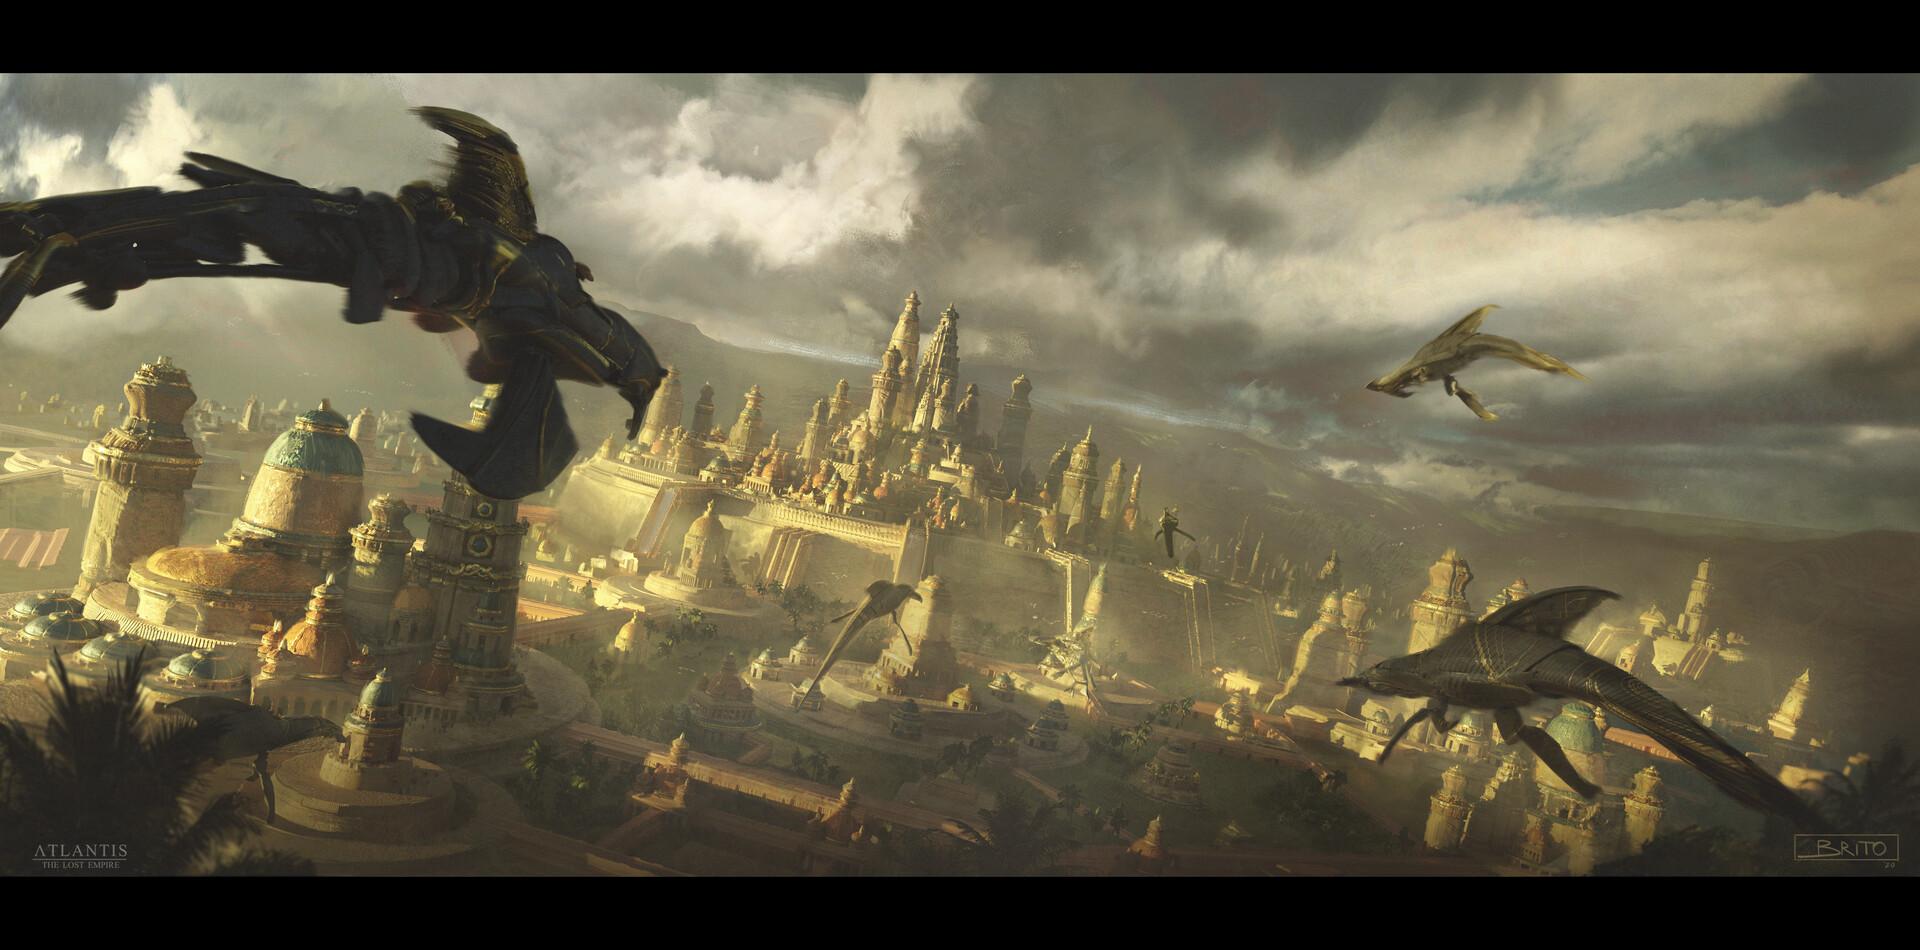 Atlantide, l'Empire Perdu [Walt Disney - 2001] - Page 8 Eduardo-brito-opening-shot-render